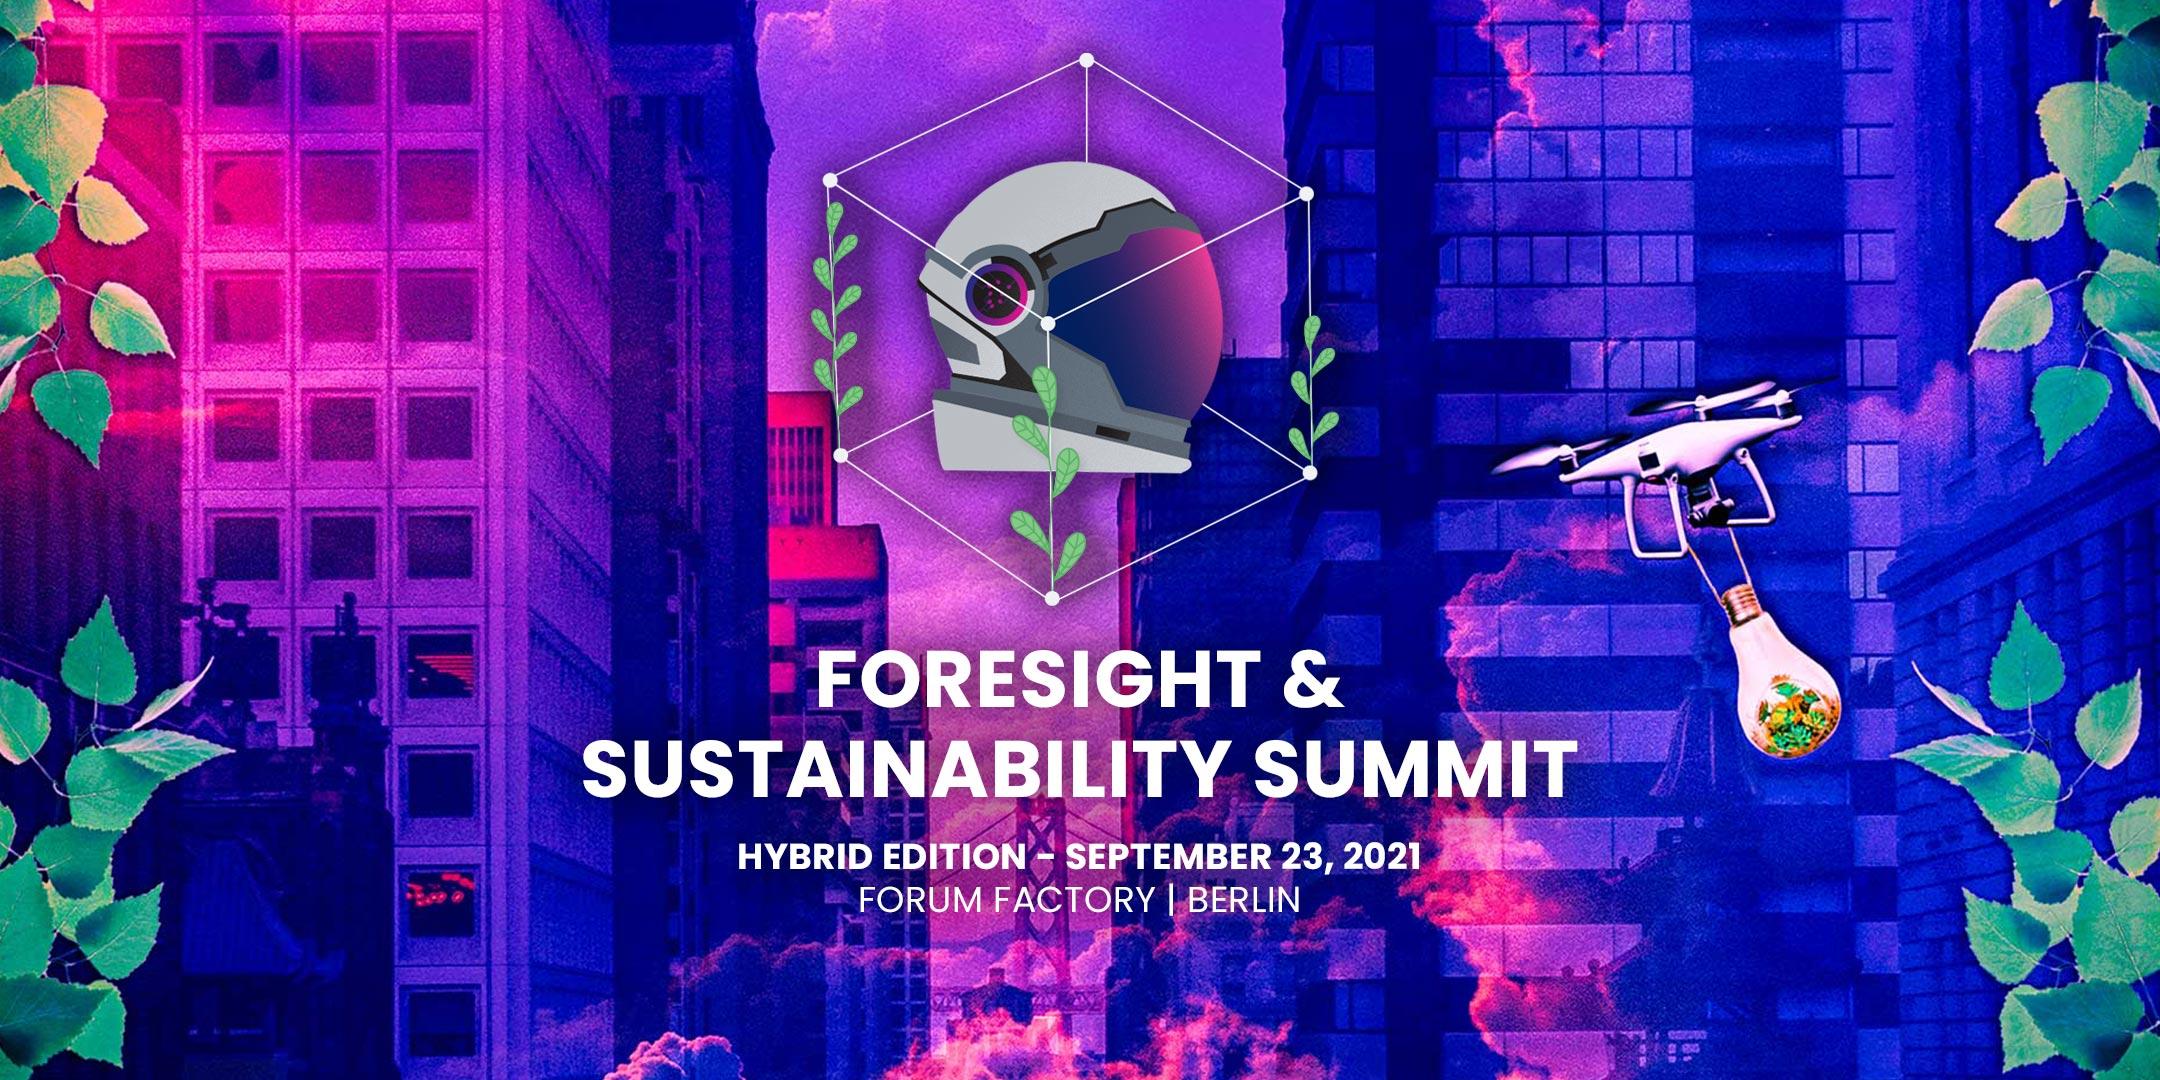 2021 Foresight & Sustainability Summit